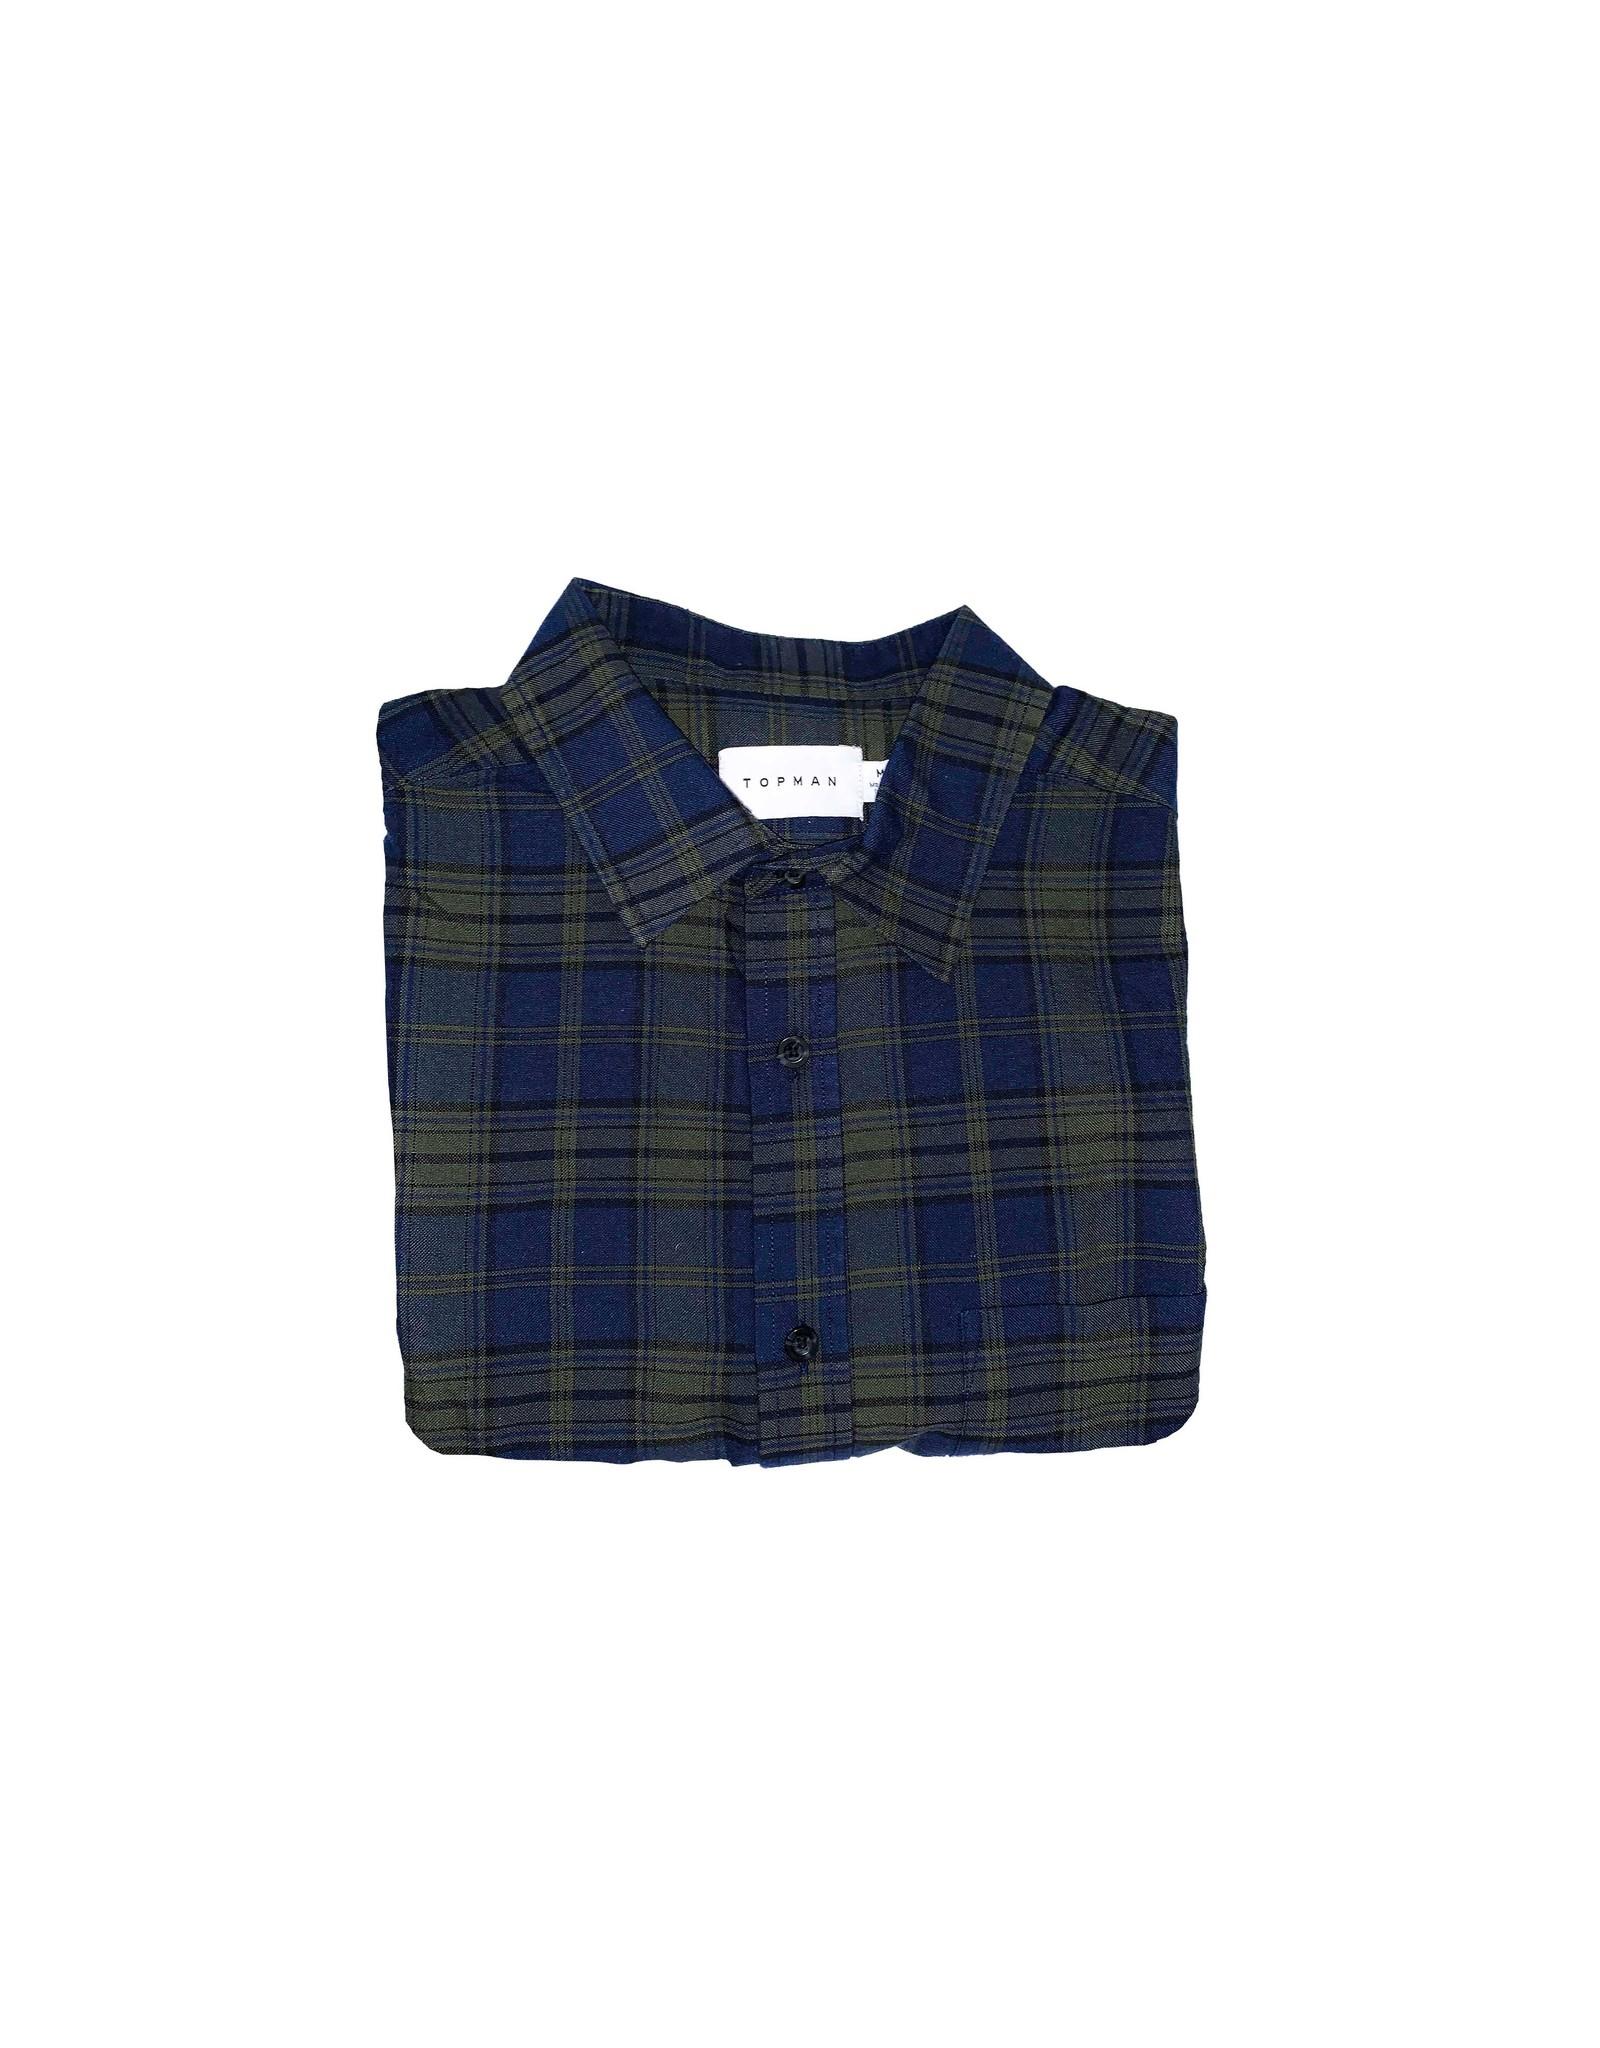 TOPMAN TOPMAN Check Shirt in Green & Navy